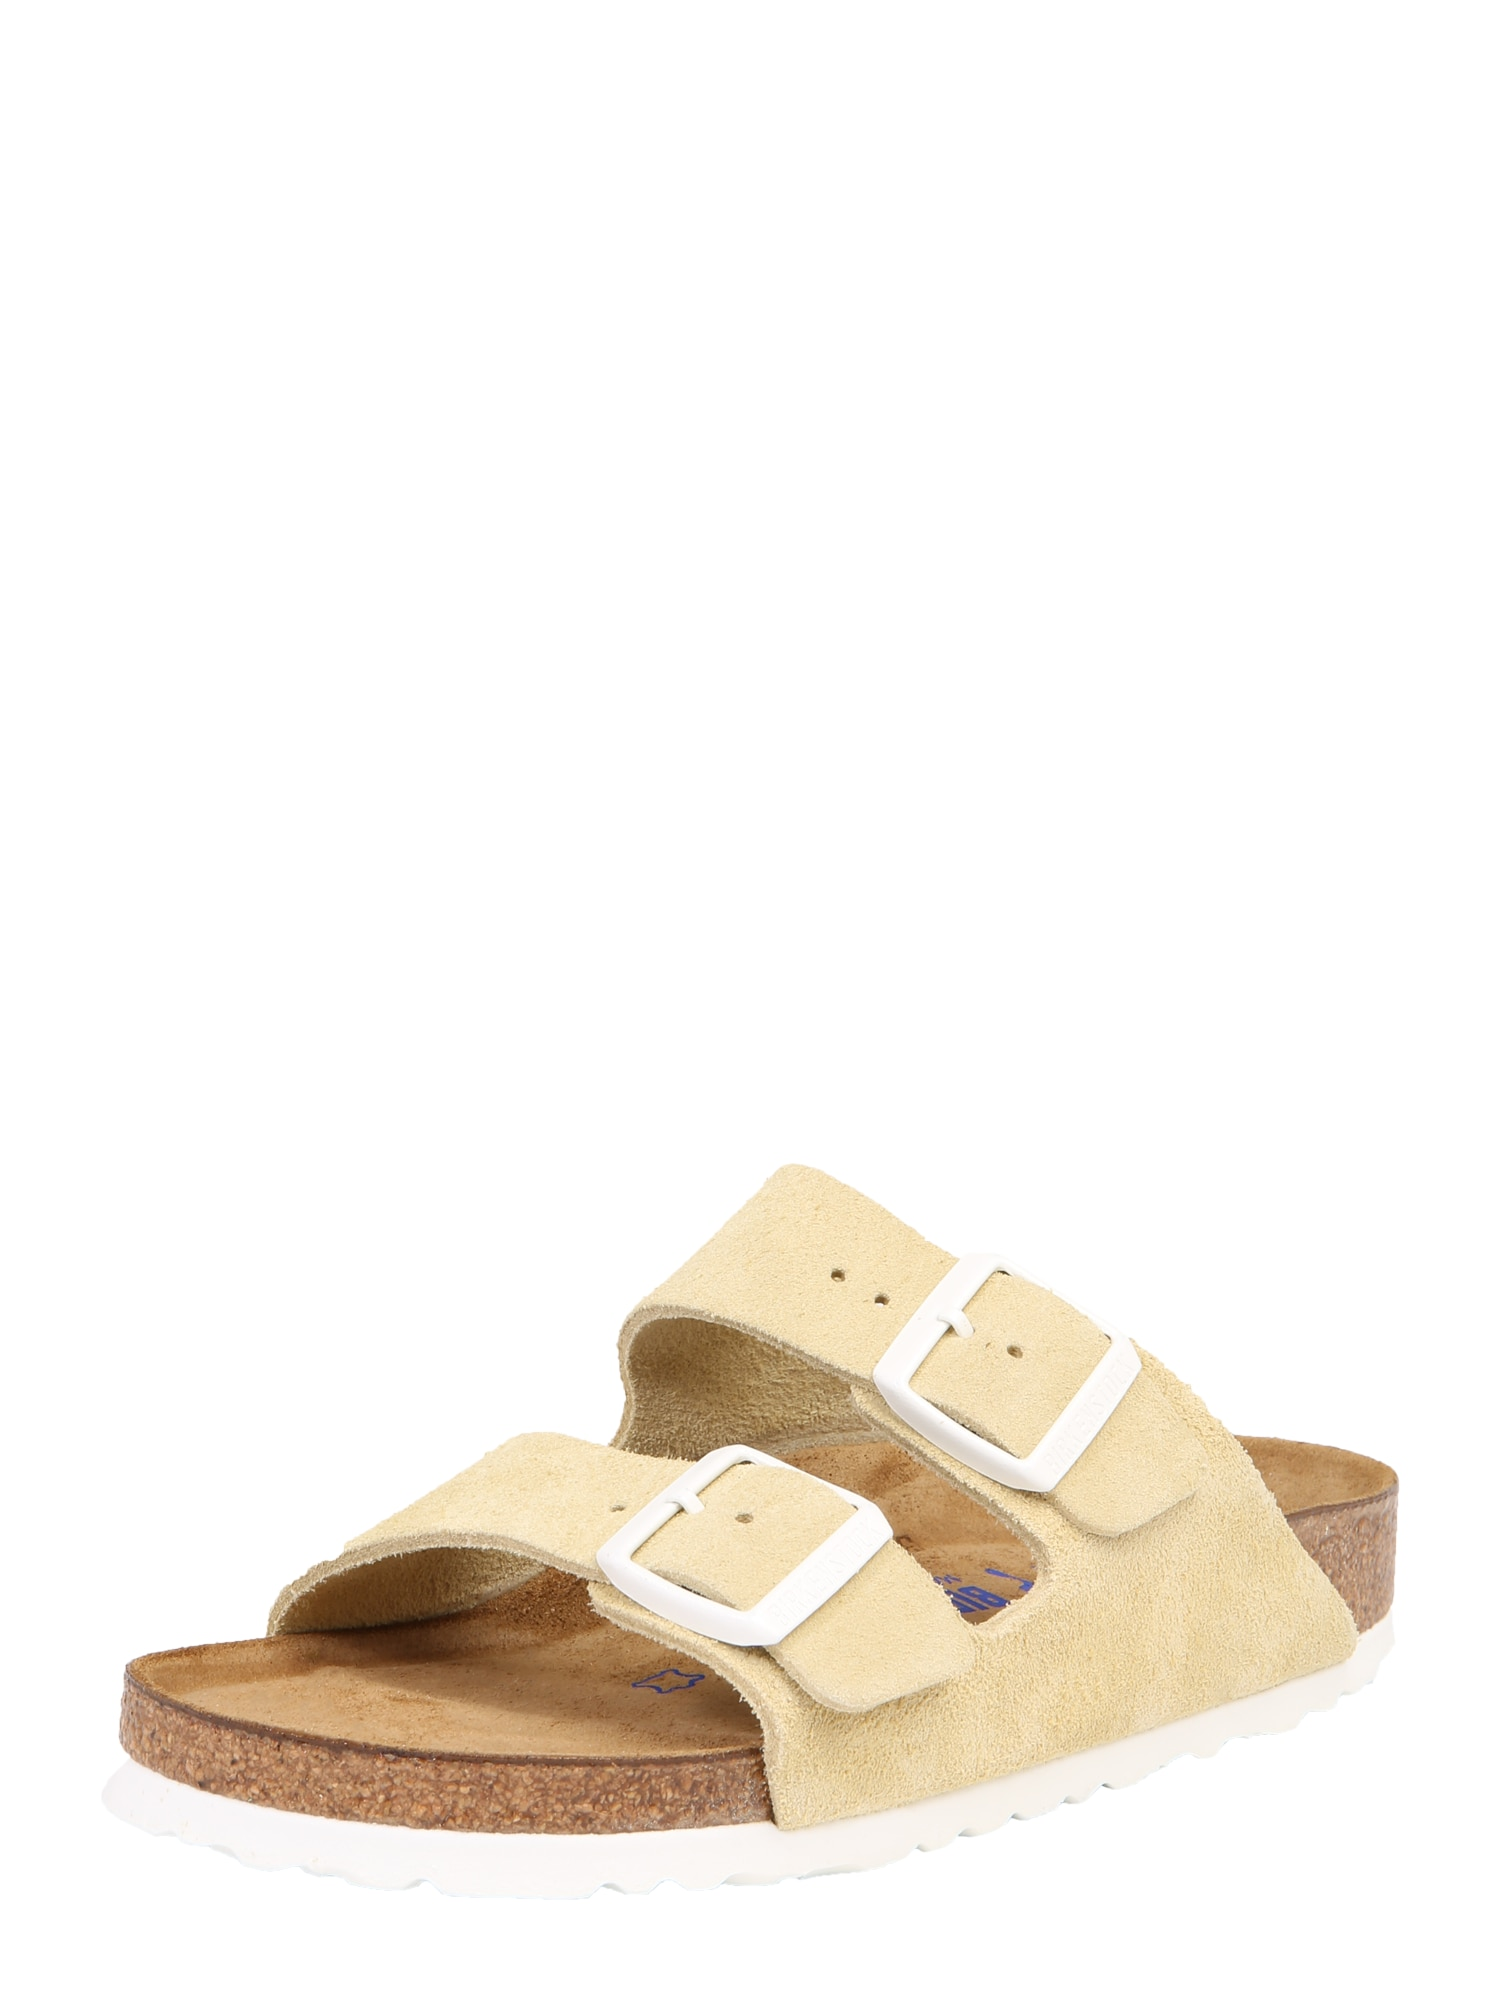 Pantofle Arizona Suede pastelově žlutá bílá BIRKENSTOCK